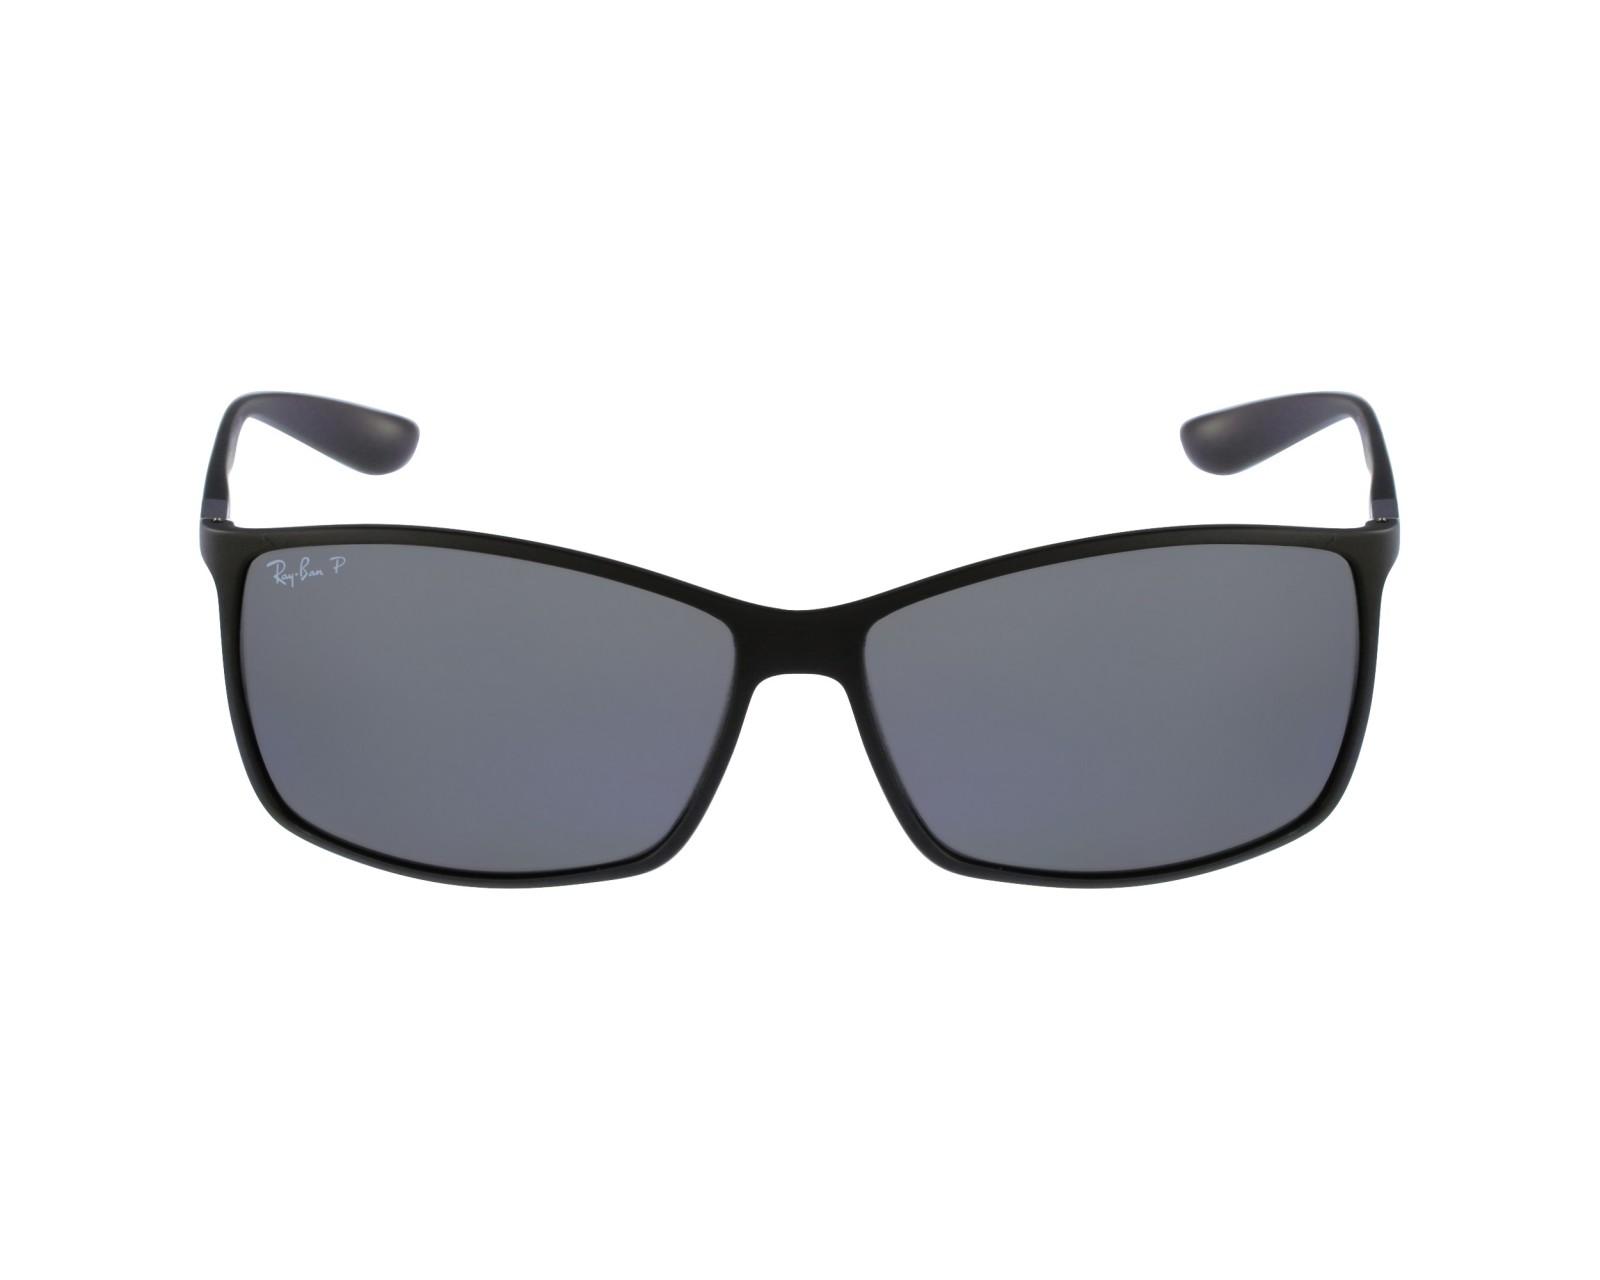 e6b0dca567c758 Sunglasses Ray-Ban RB-4179 601-S 82 62-15 Black